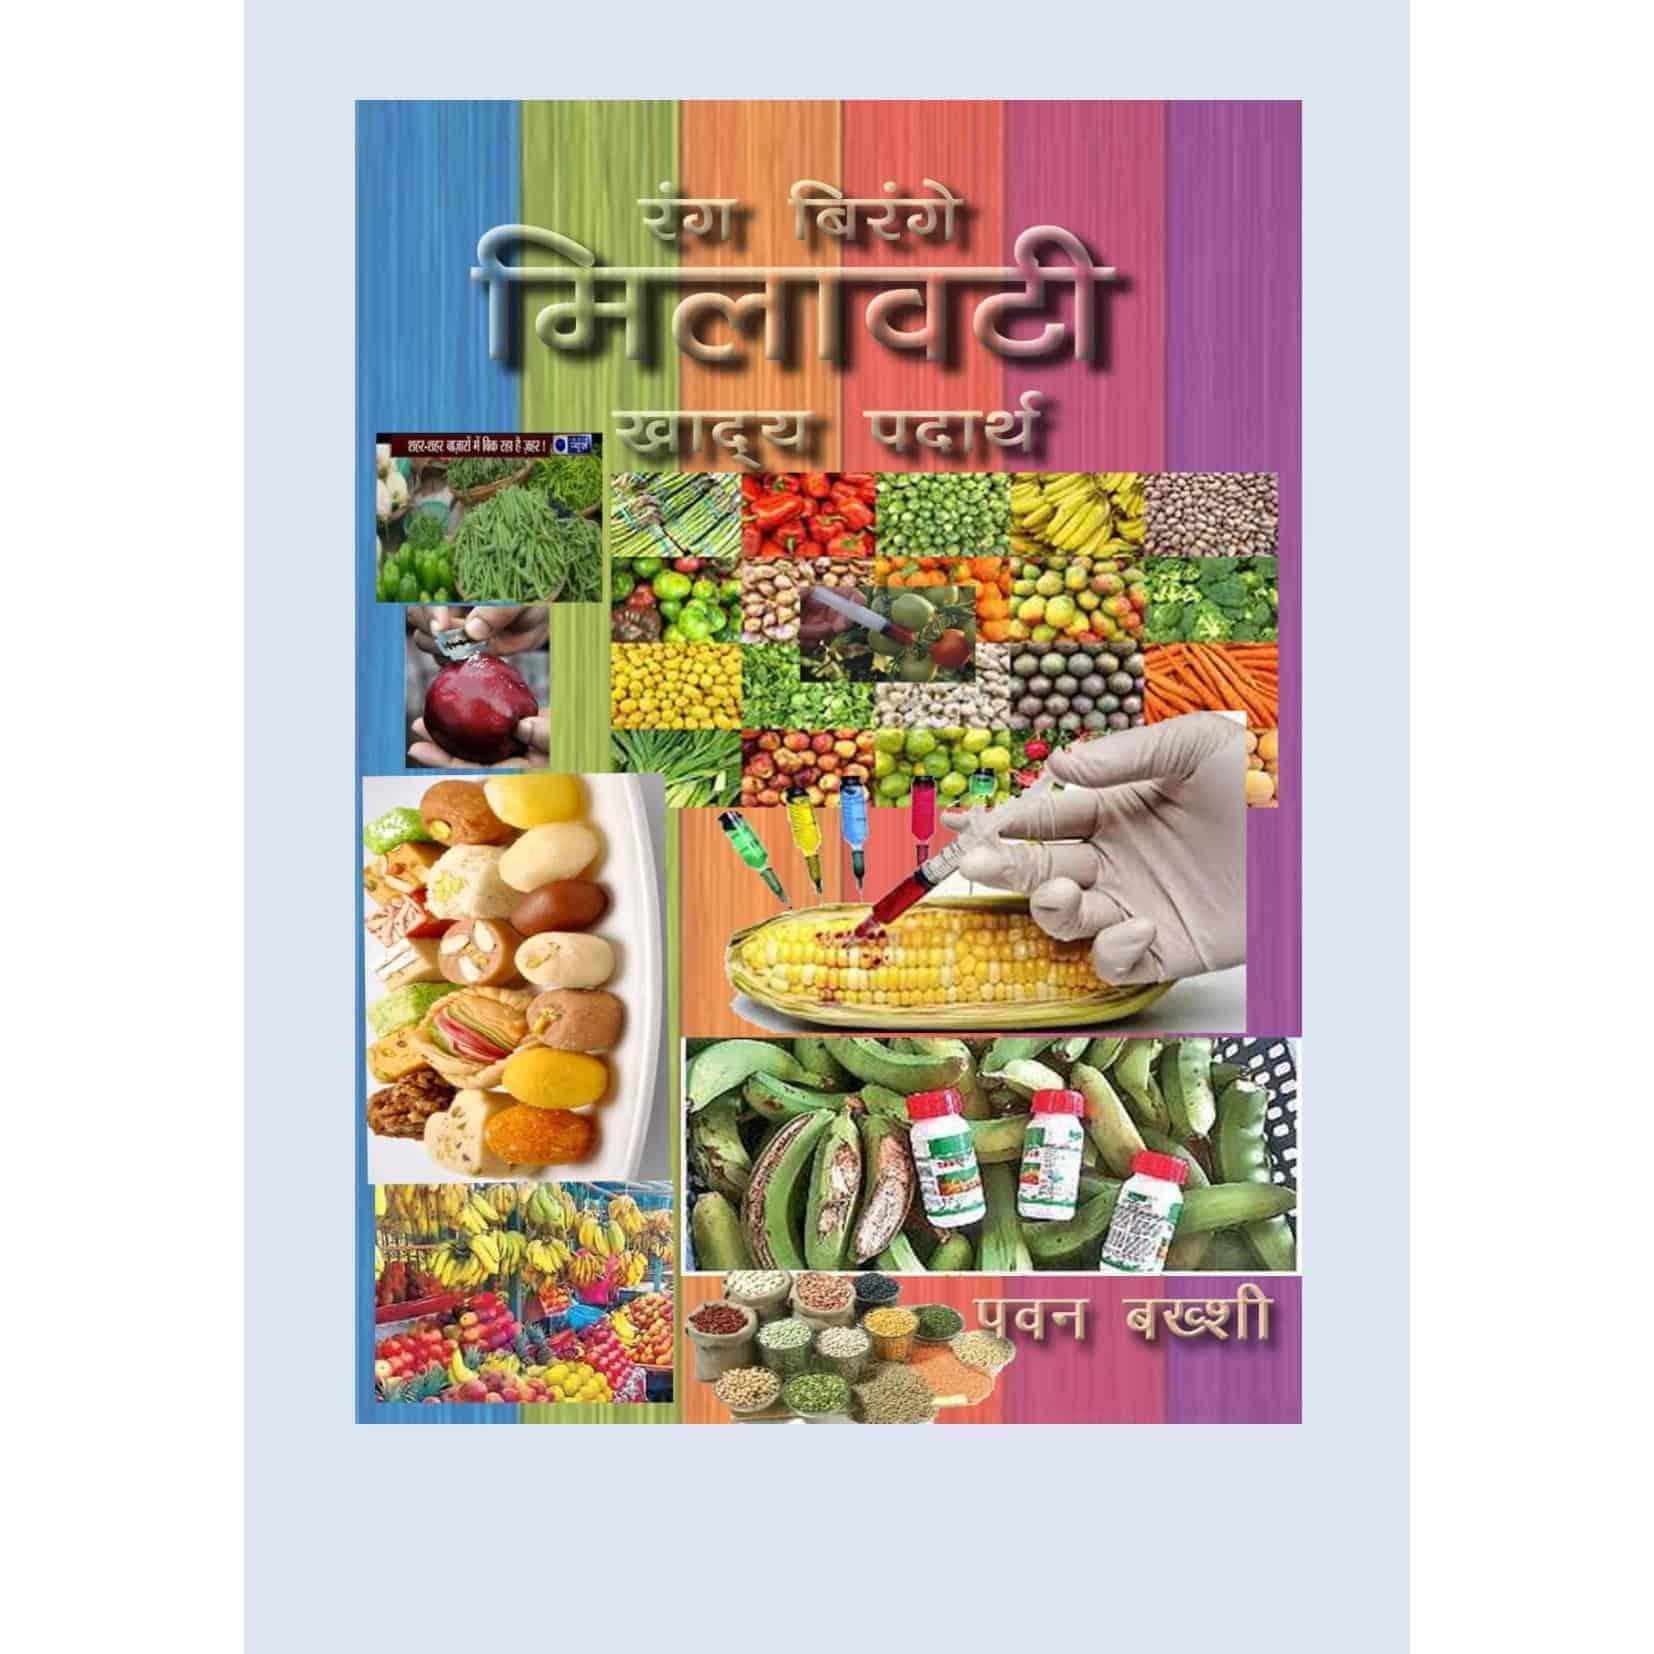 Colorful adulterated foods (रंग बिरंगे मिलावटी खाद्य पदार्थ)- Book, Kartmy